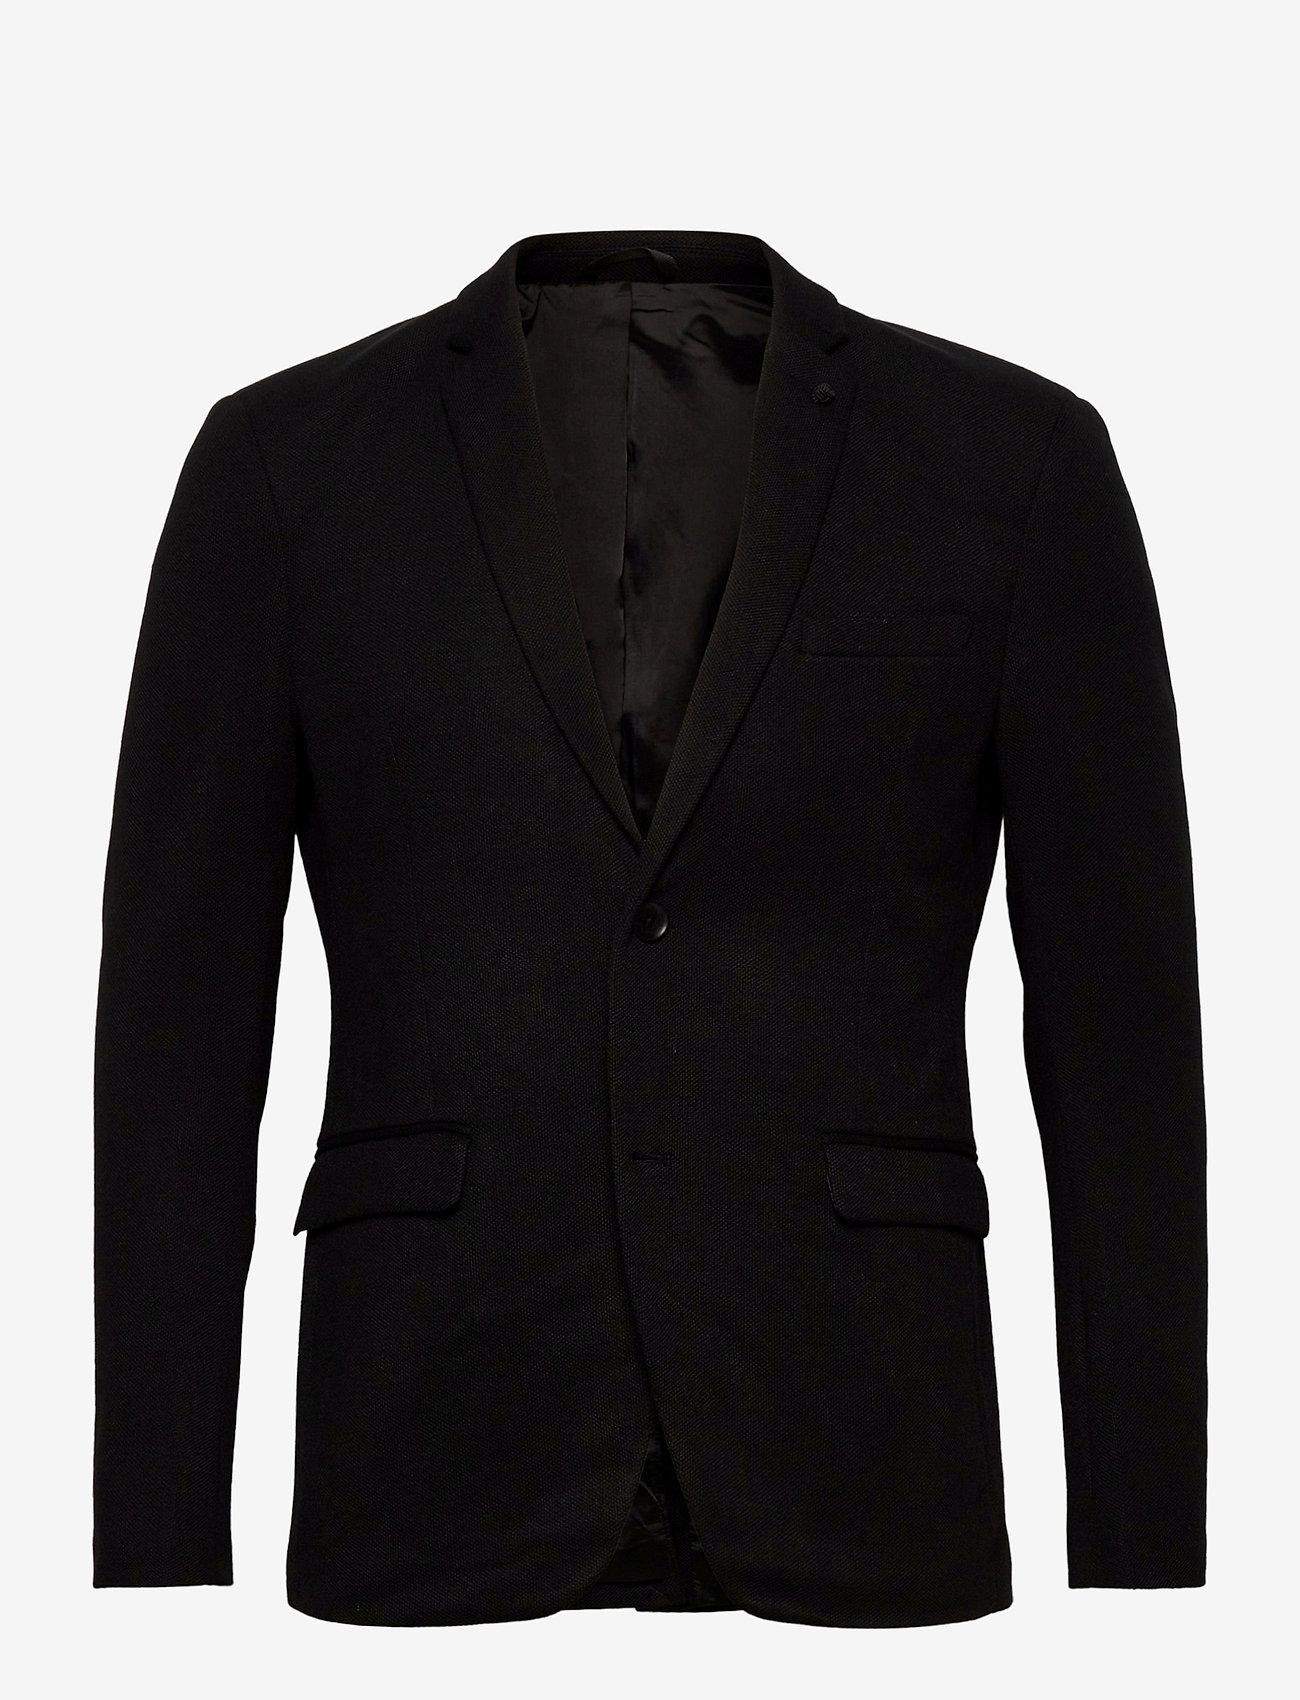 Esprit Casual - Blazers knitted - blazers - black - 0